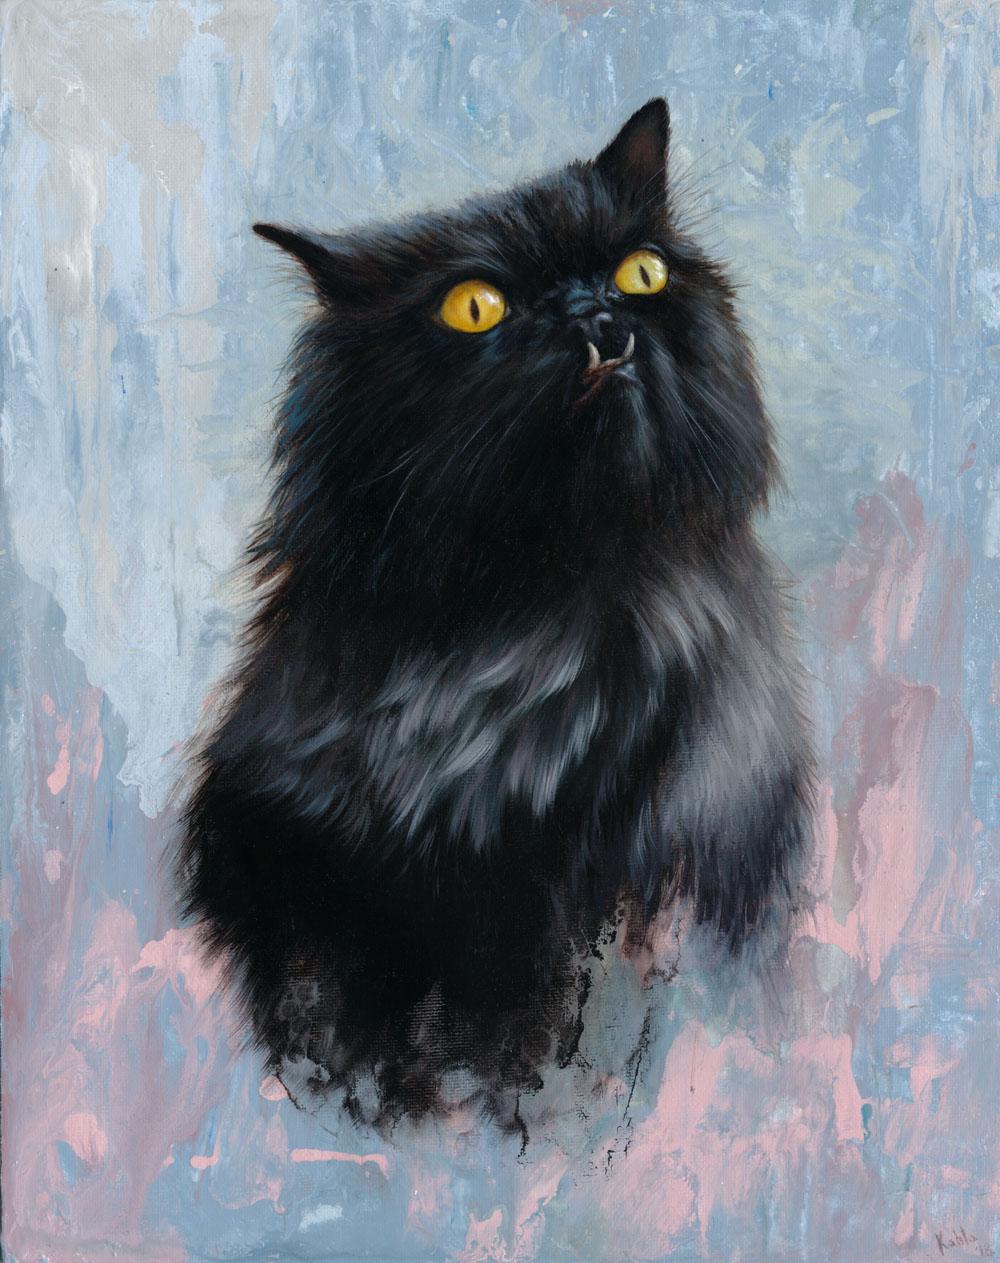 Princess Monster Truck Cat Painting